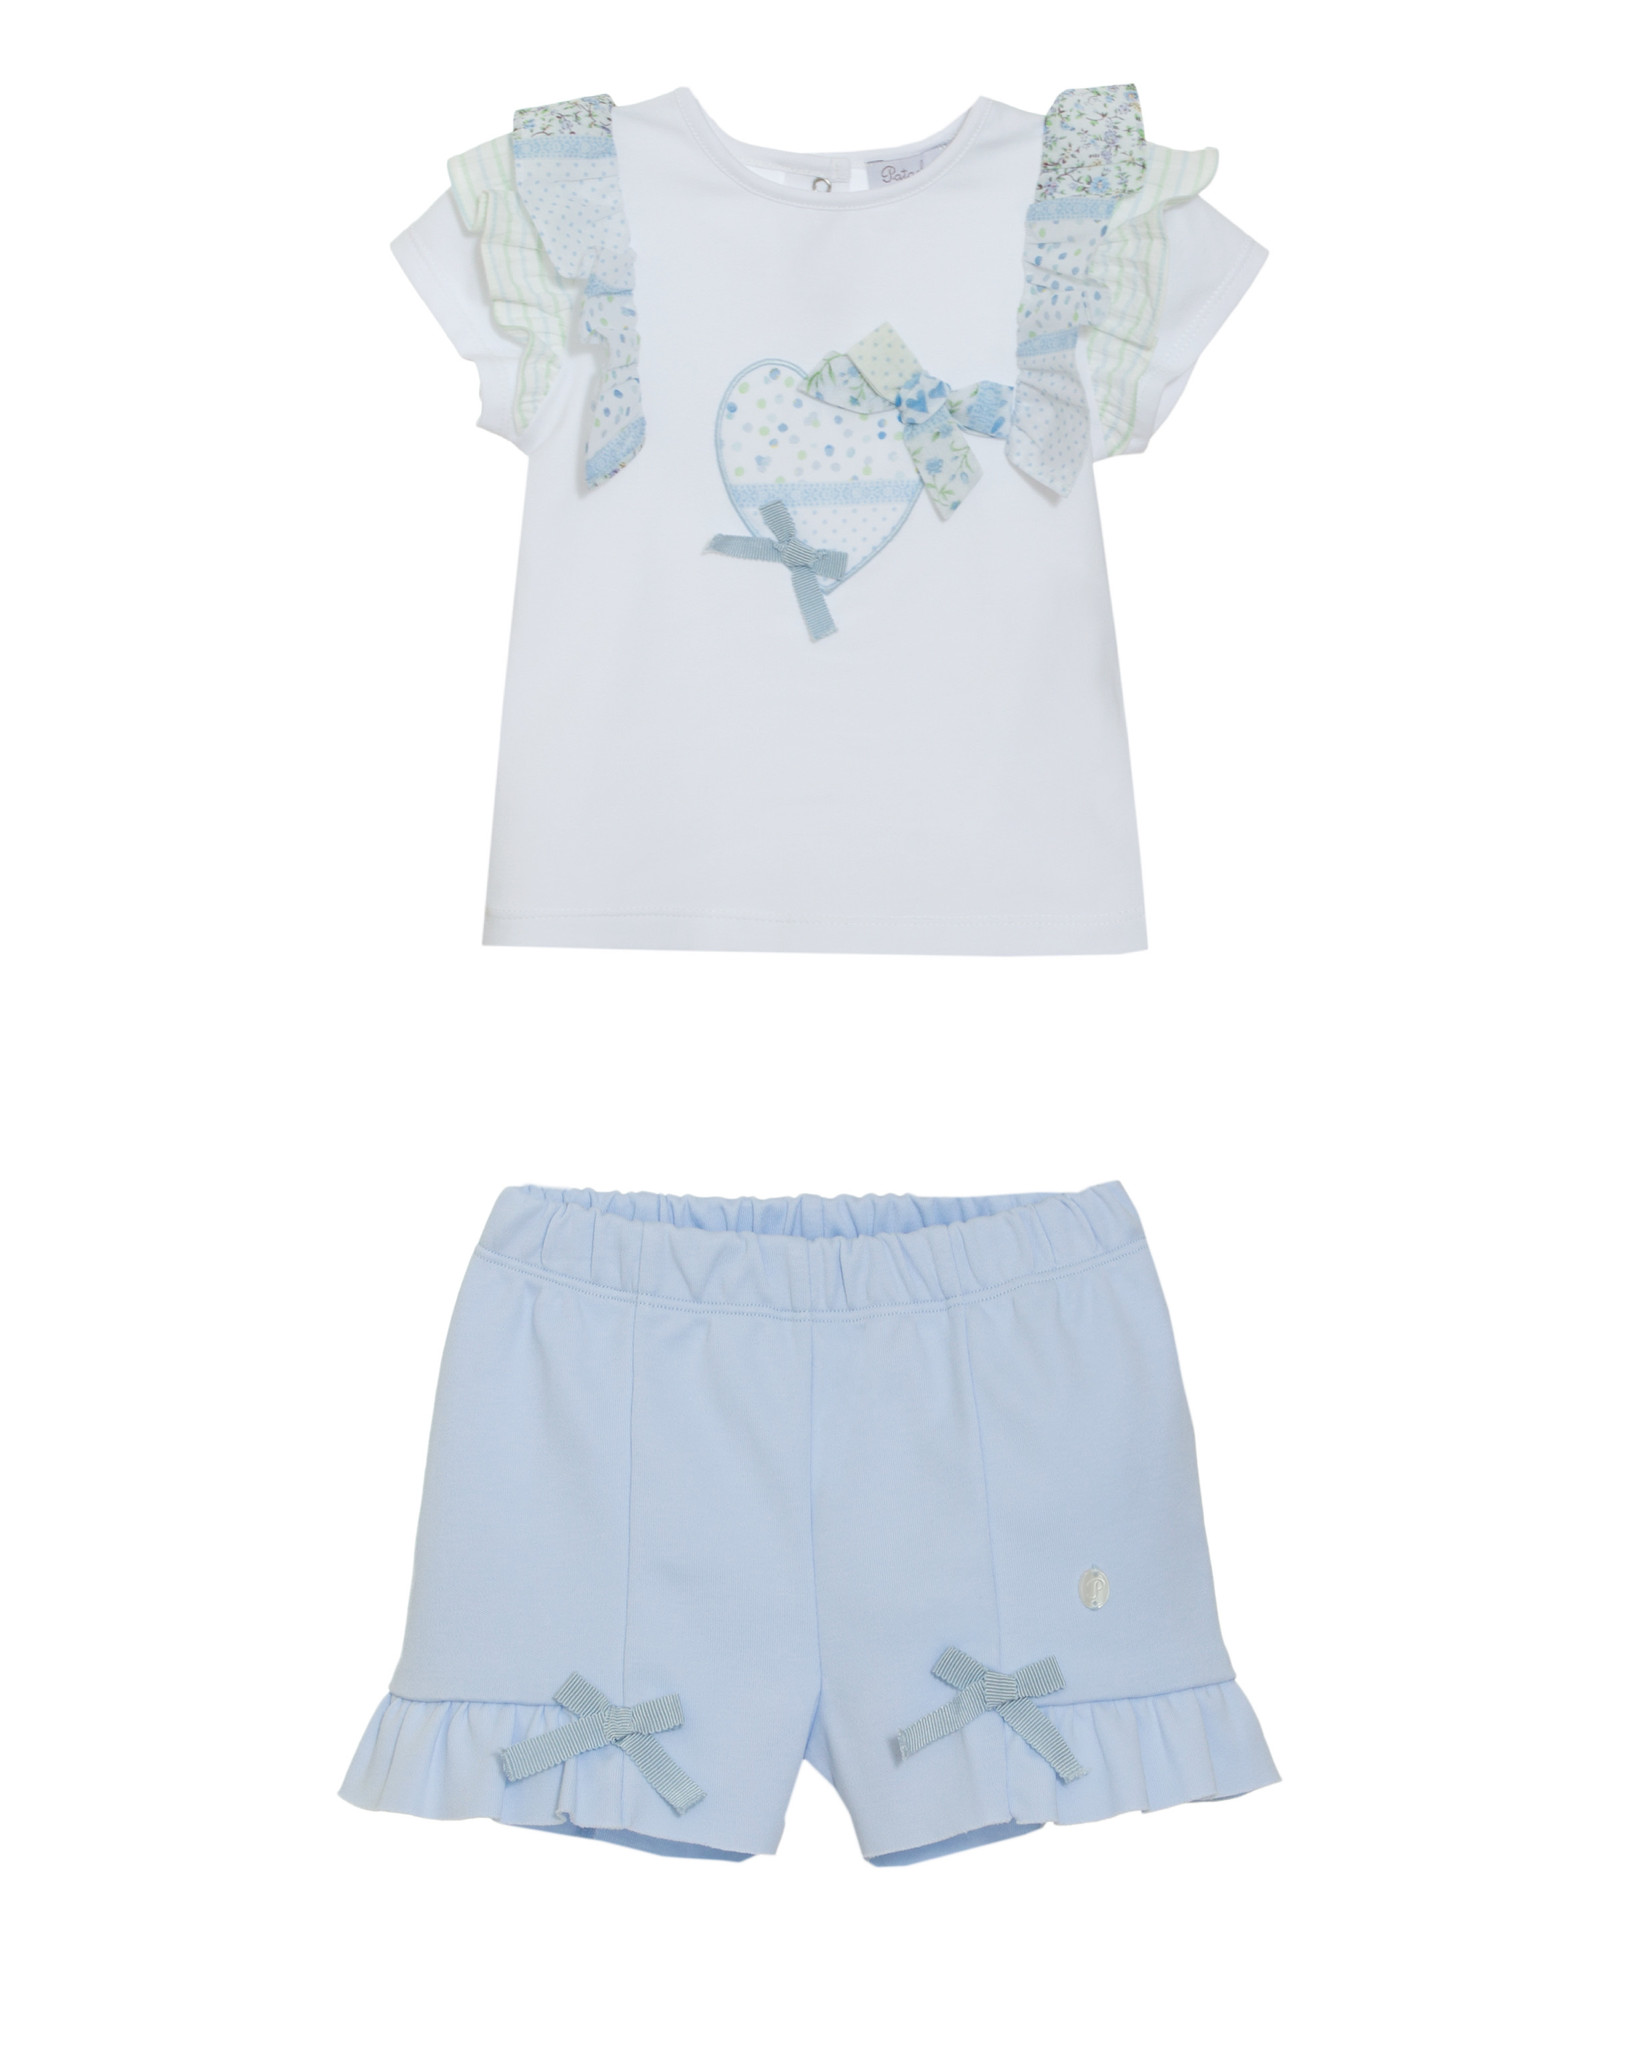 Patachou Patachou  Girls Blue Short Set   S21